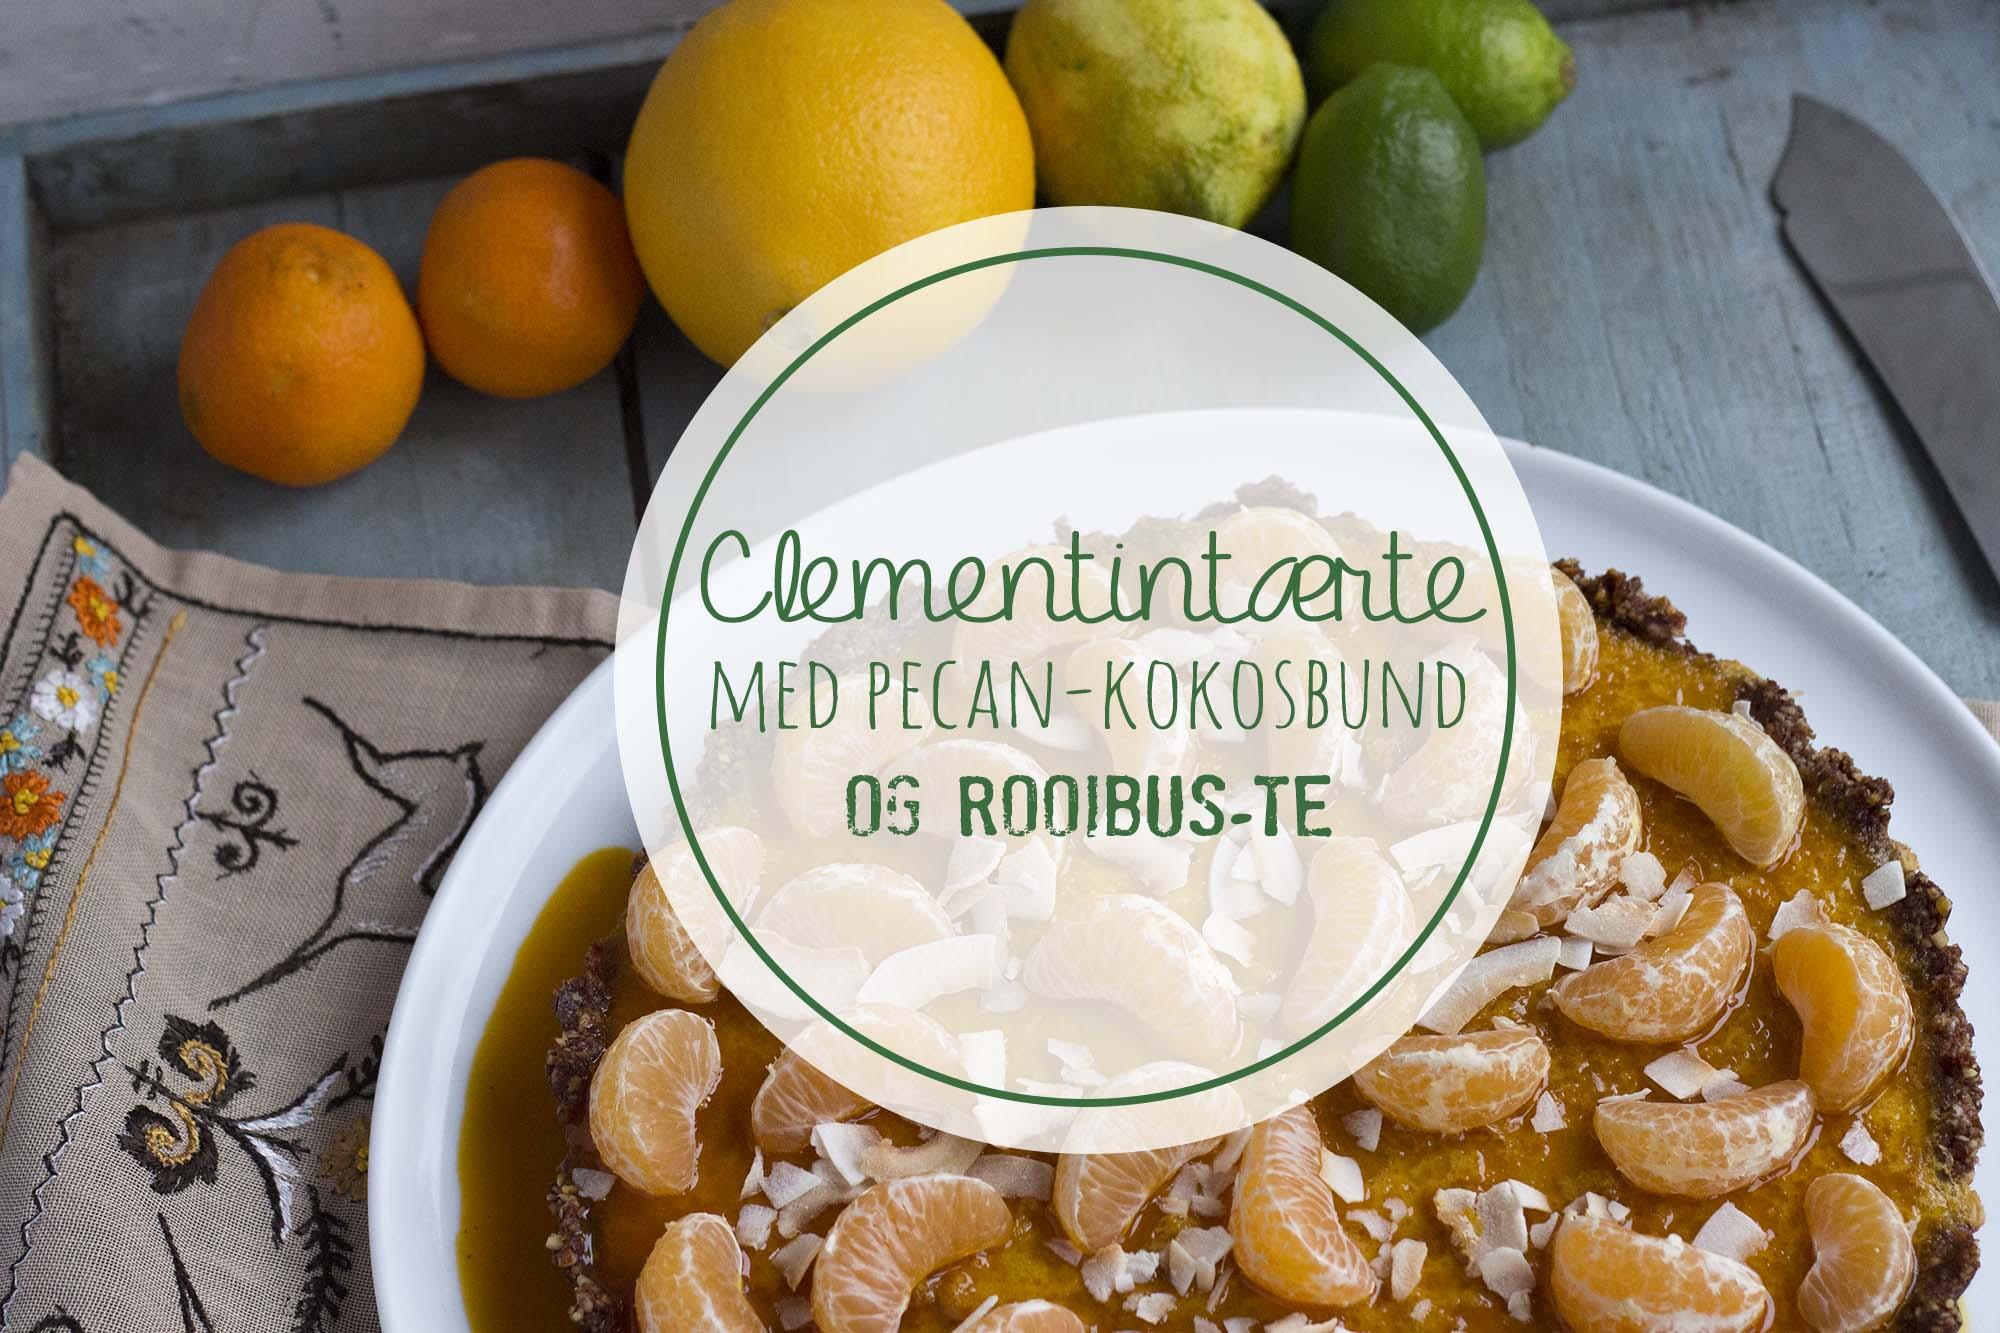 Clementintærte med pecan-kokosbund og rooibus-te